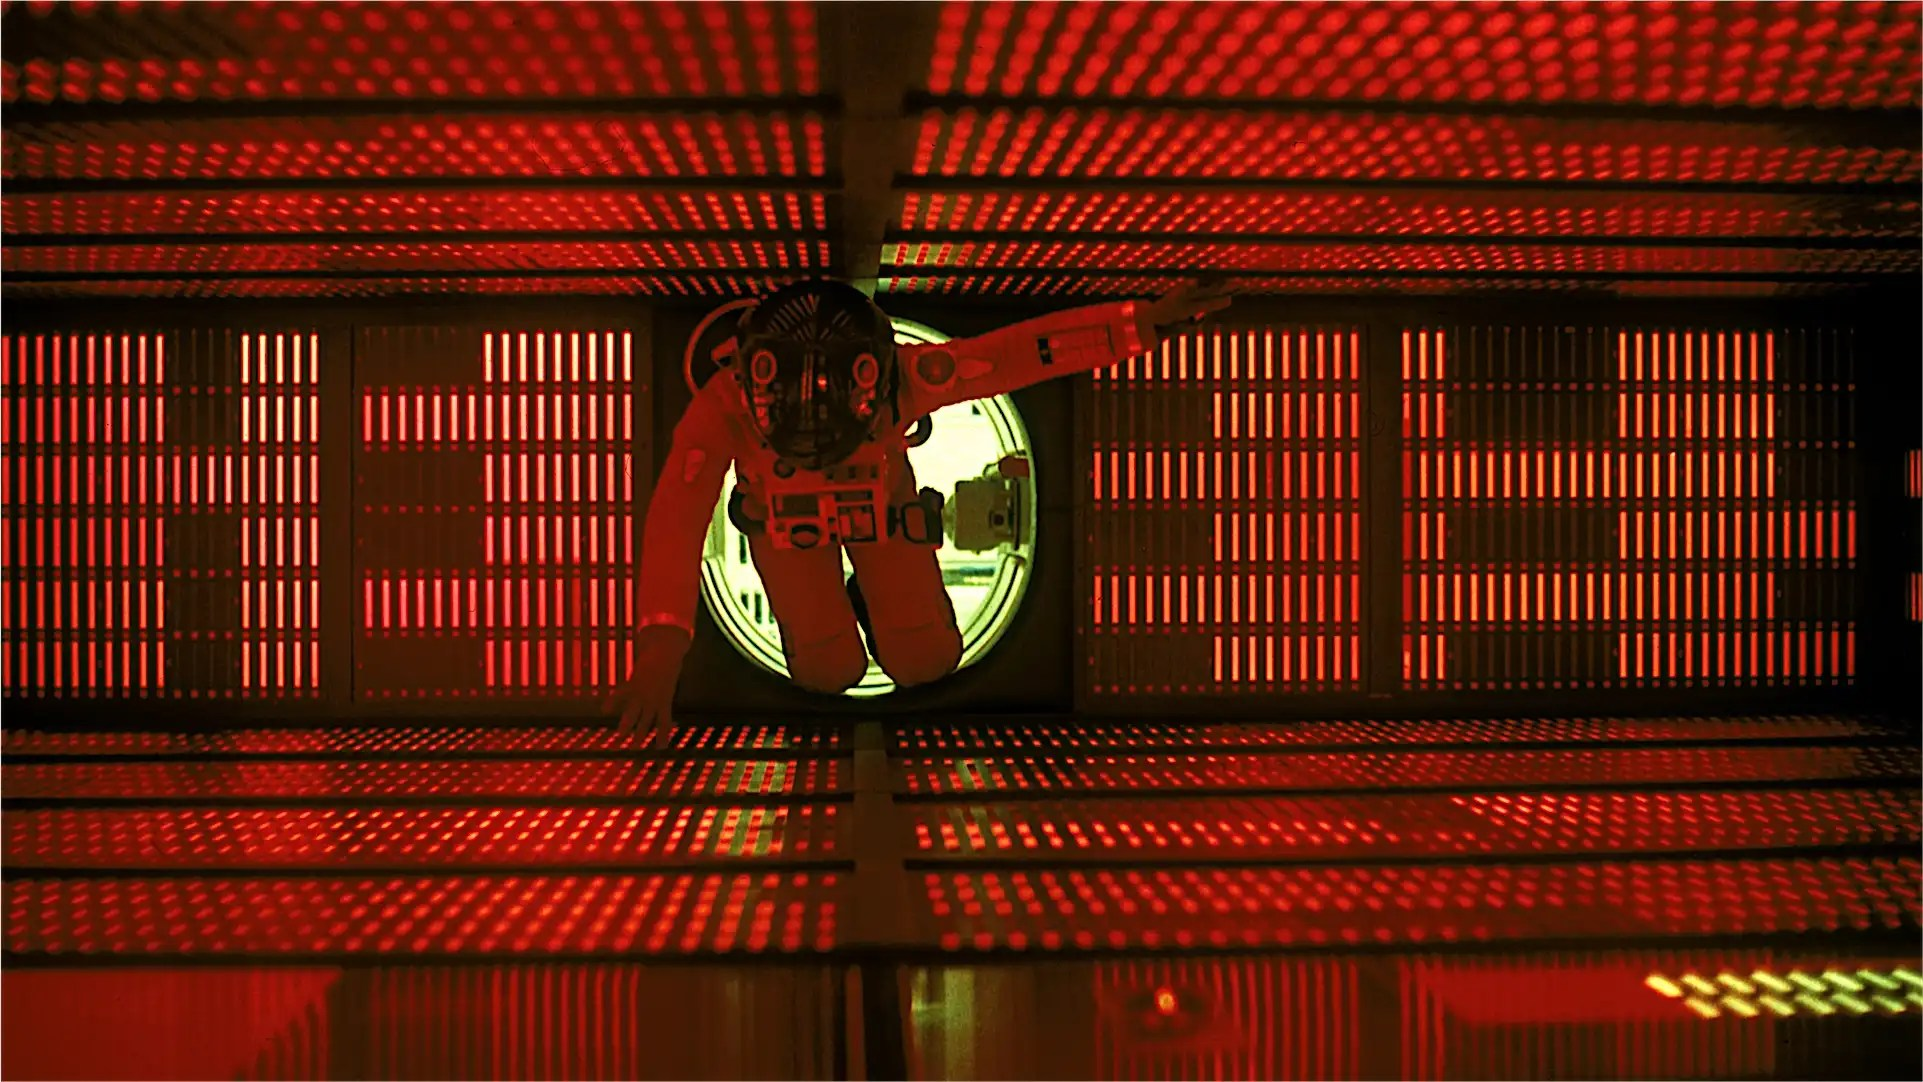 2001-A-Space-Odyssey-destaque